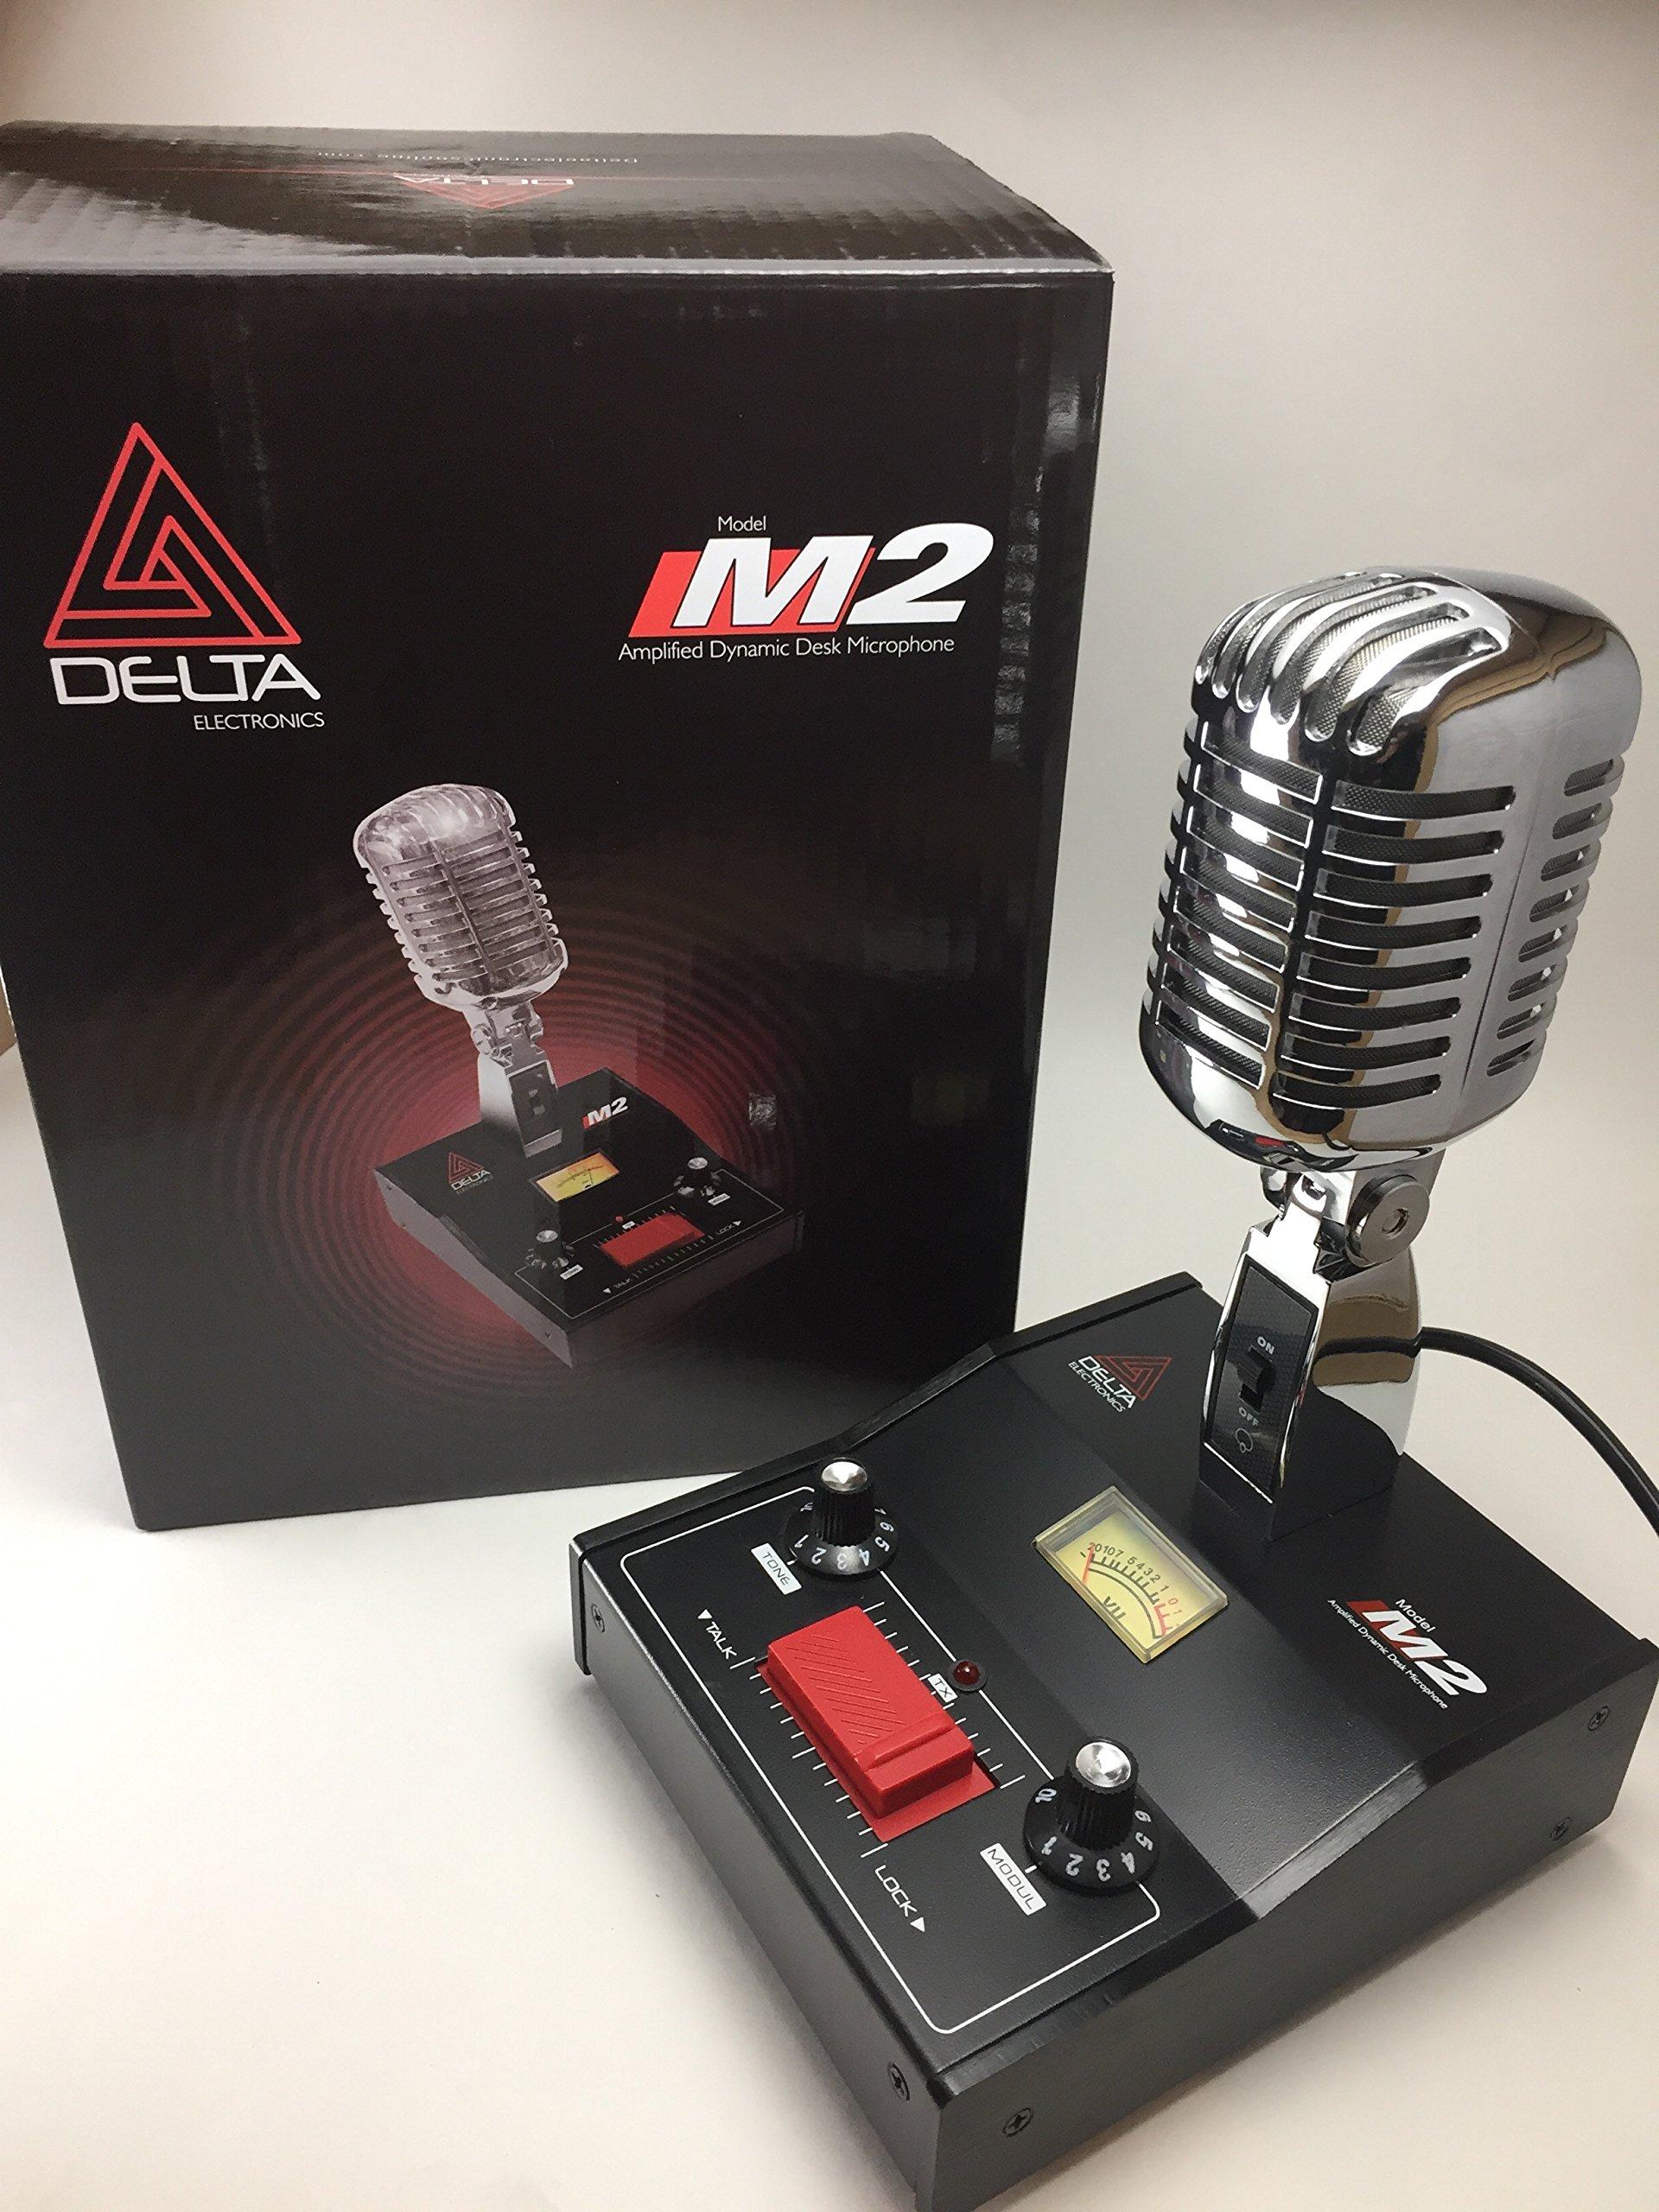 DELTA M2 AMPLIFIED DYNAMIC POWER BASE MICROPHONE 4 pin Cobra CB HAM MIC